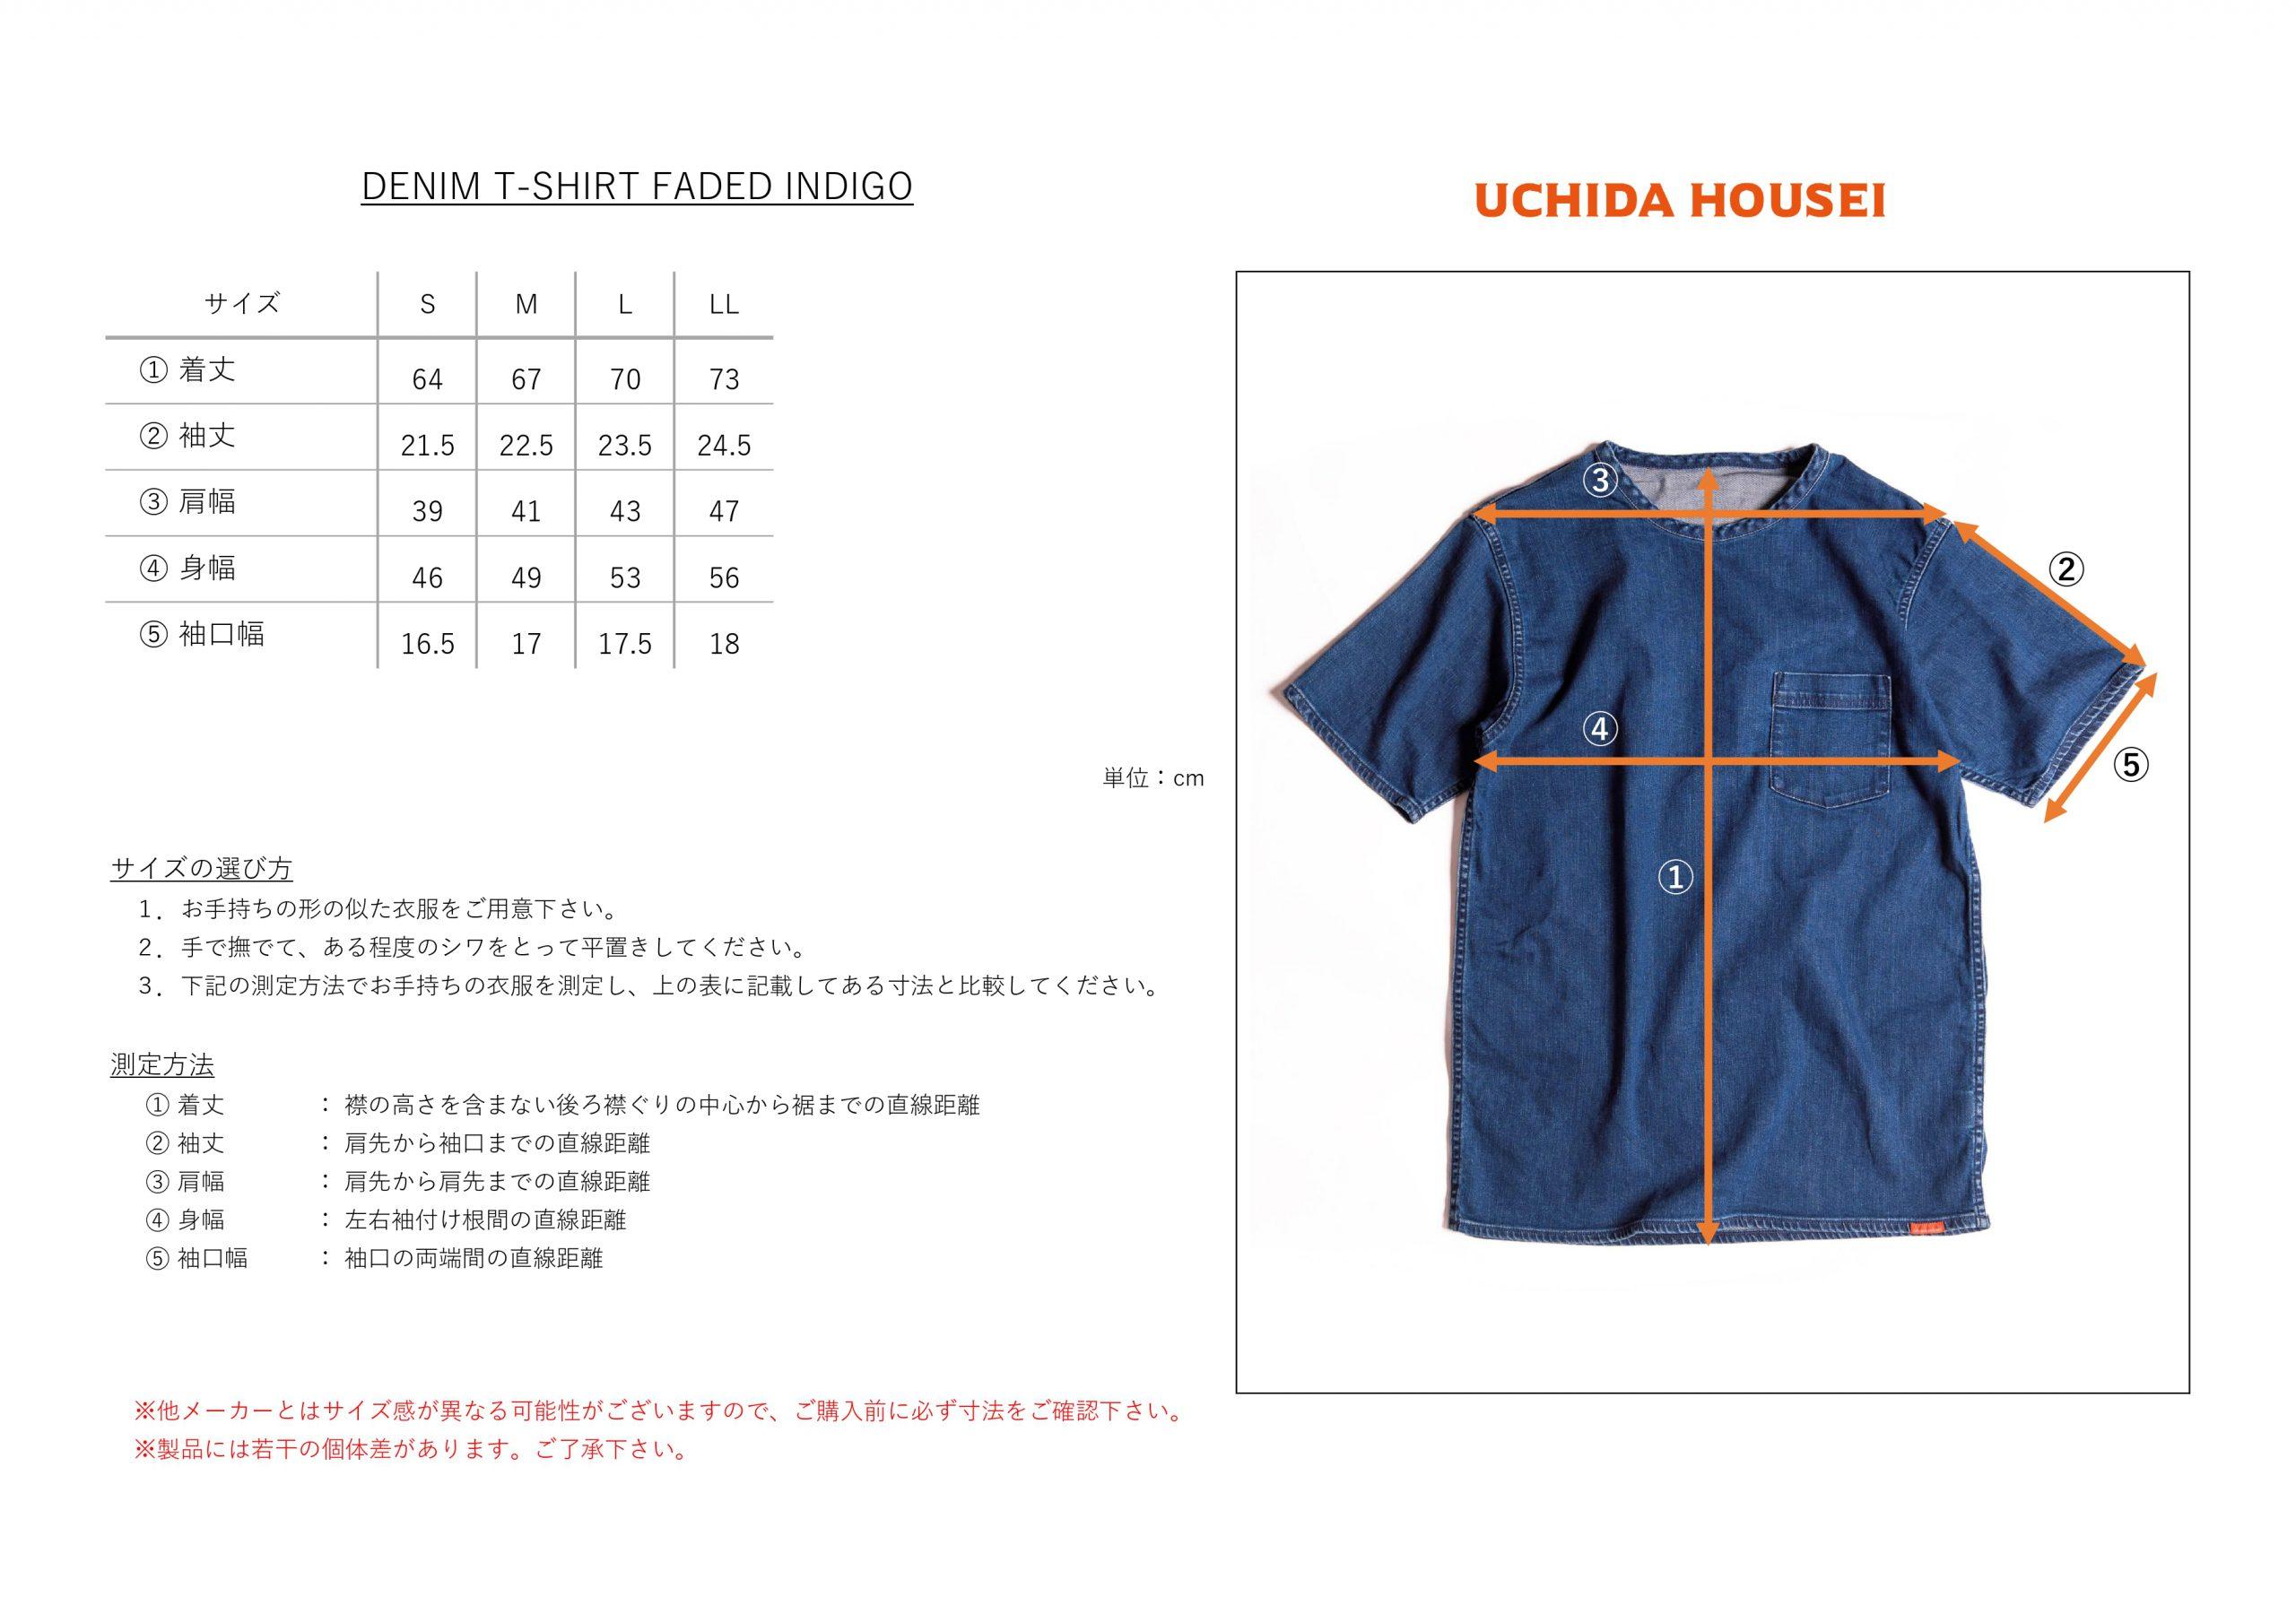 DENIM T-SHIRT FADED INDIGO【デニム Tシャツ】